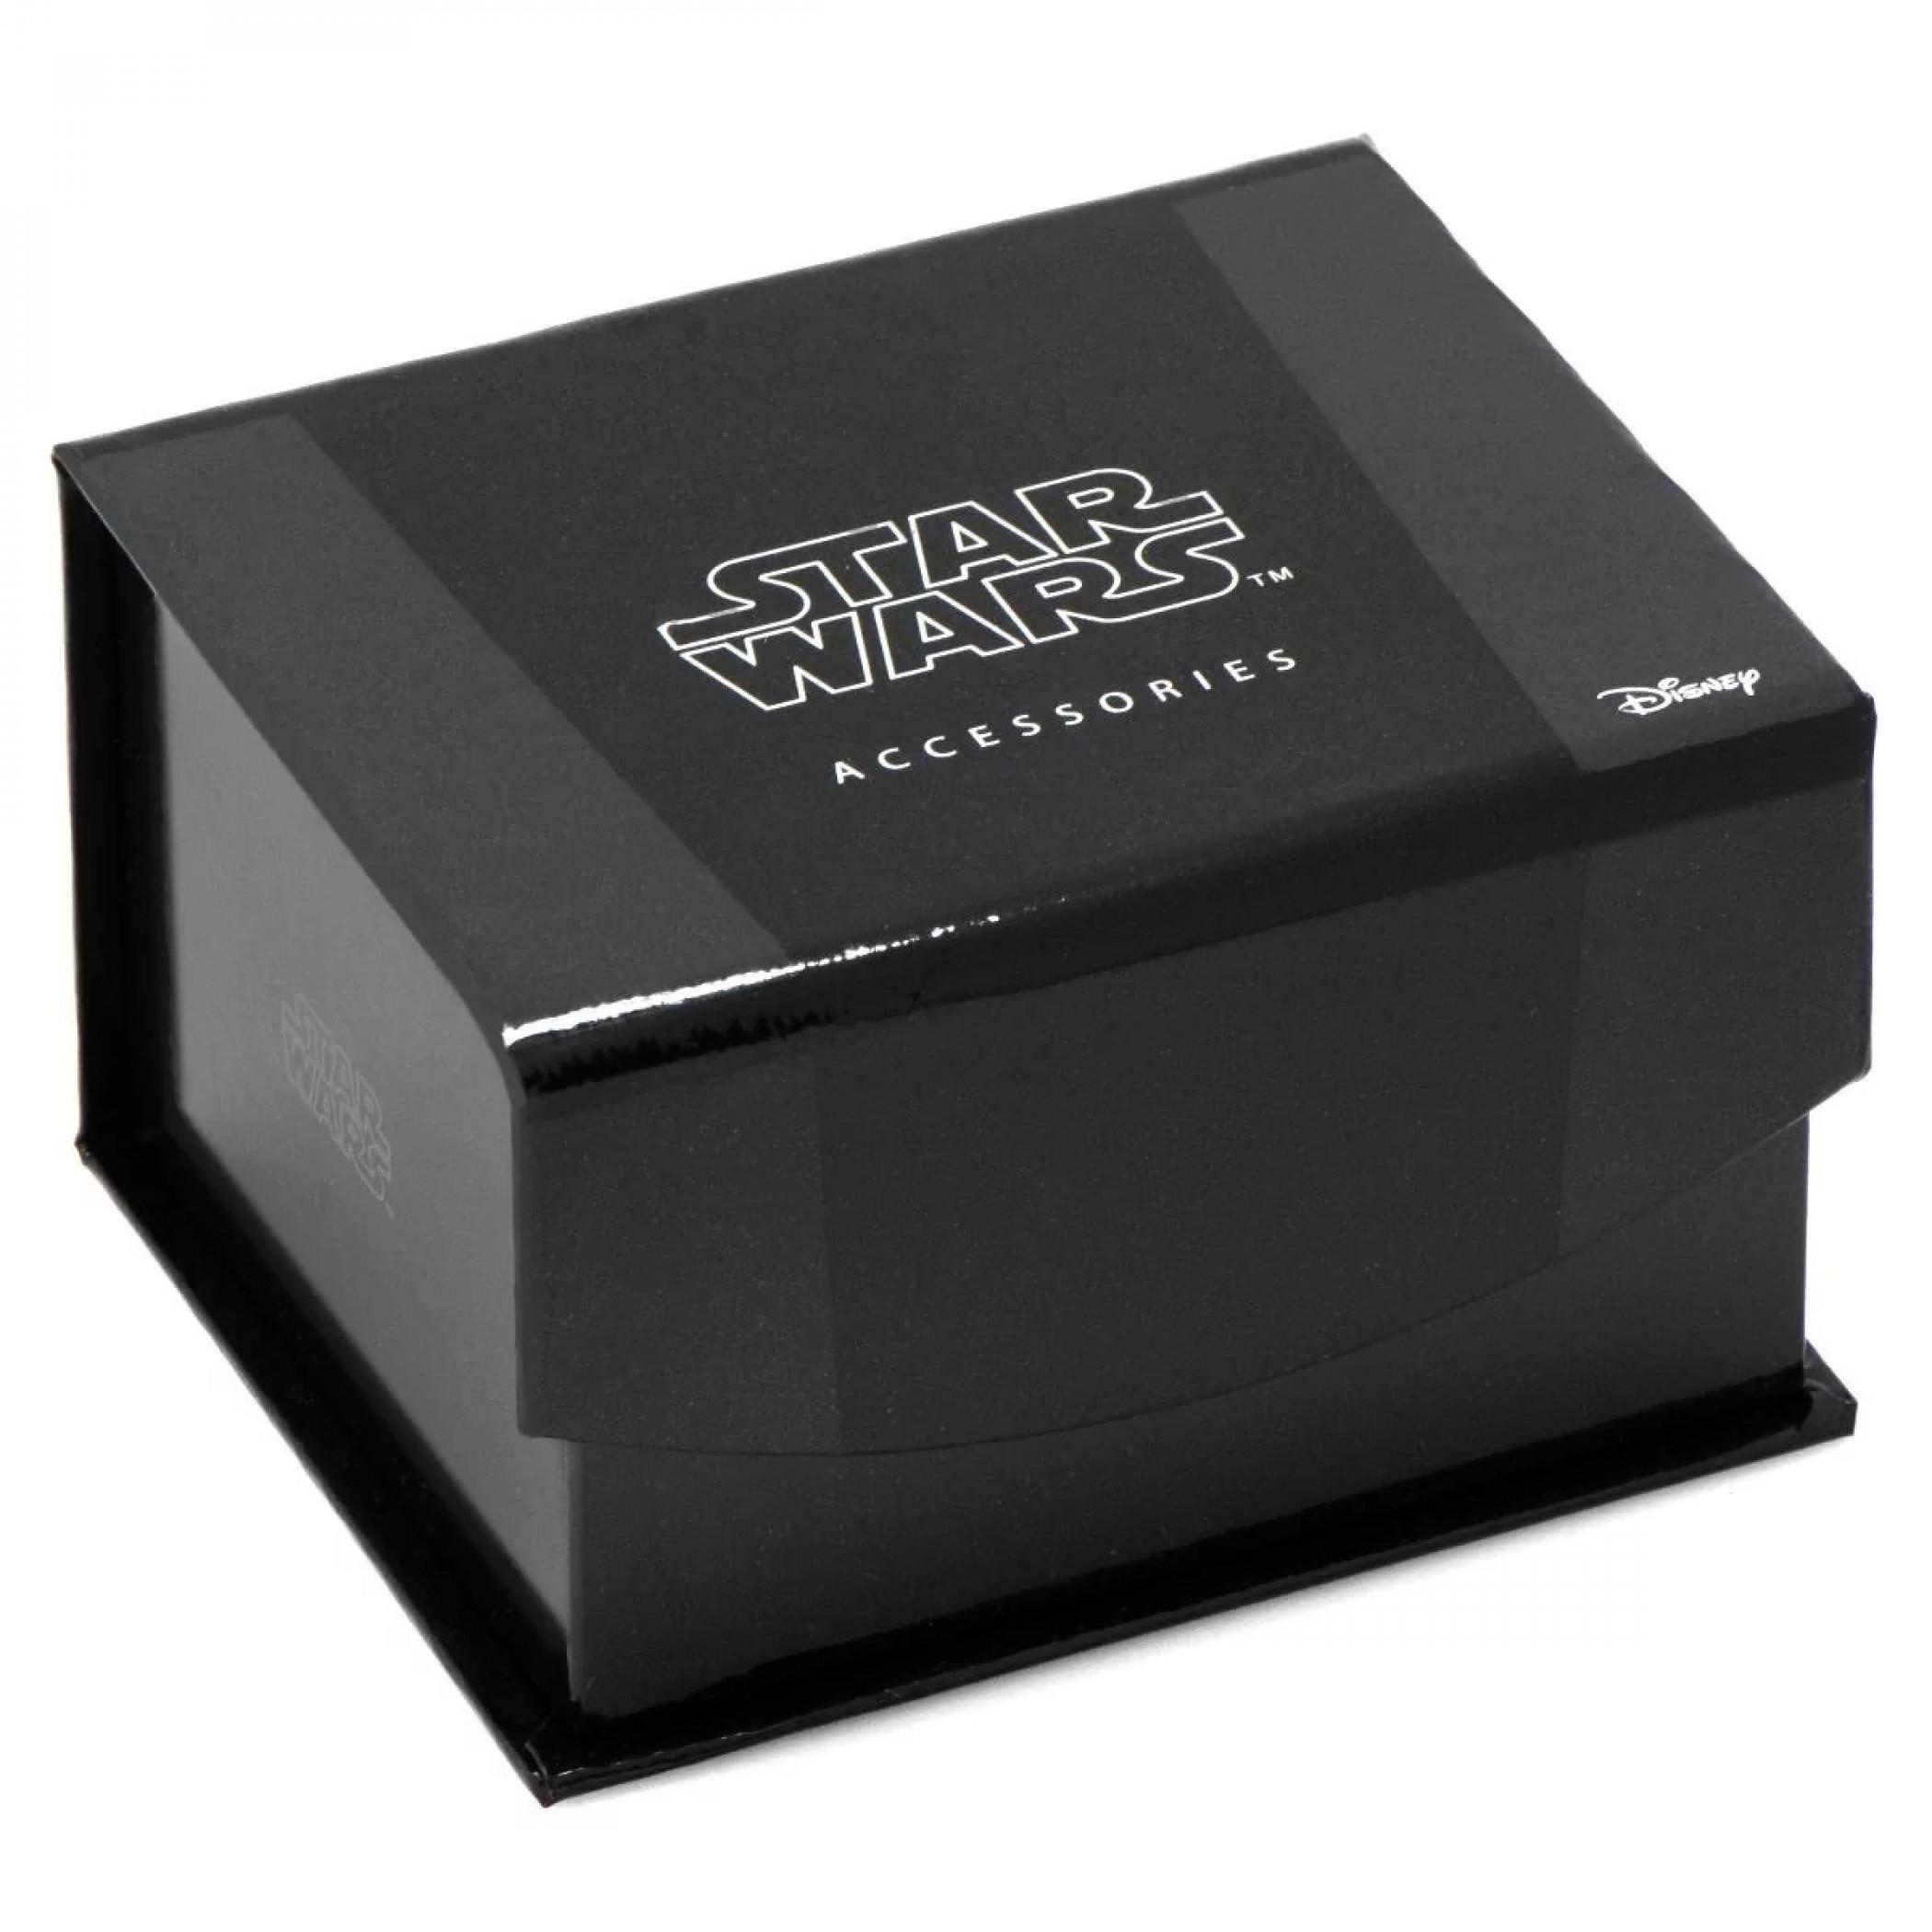 Star Wars Millennium Falcon Cutout Money Clip